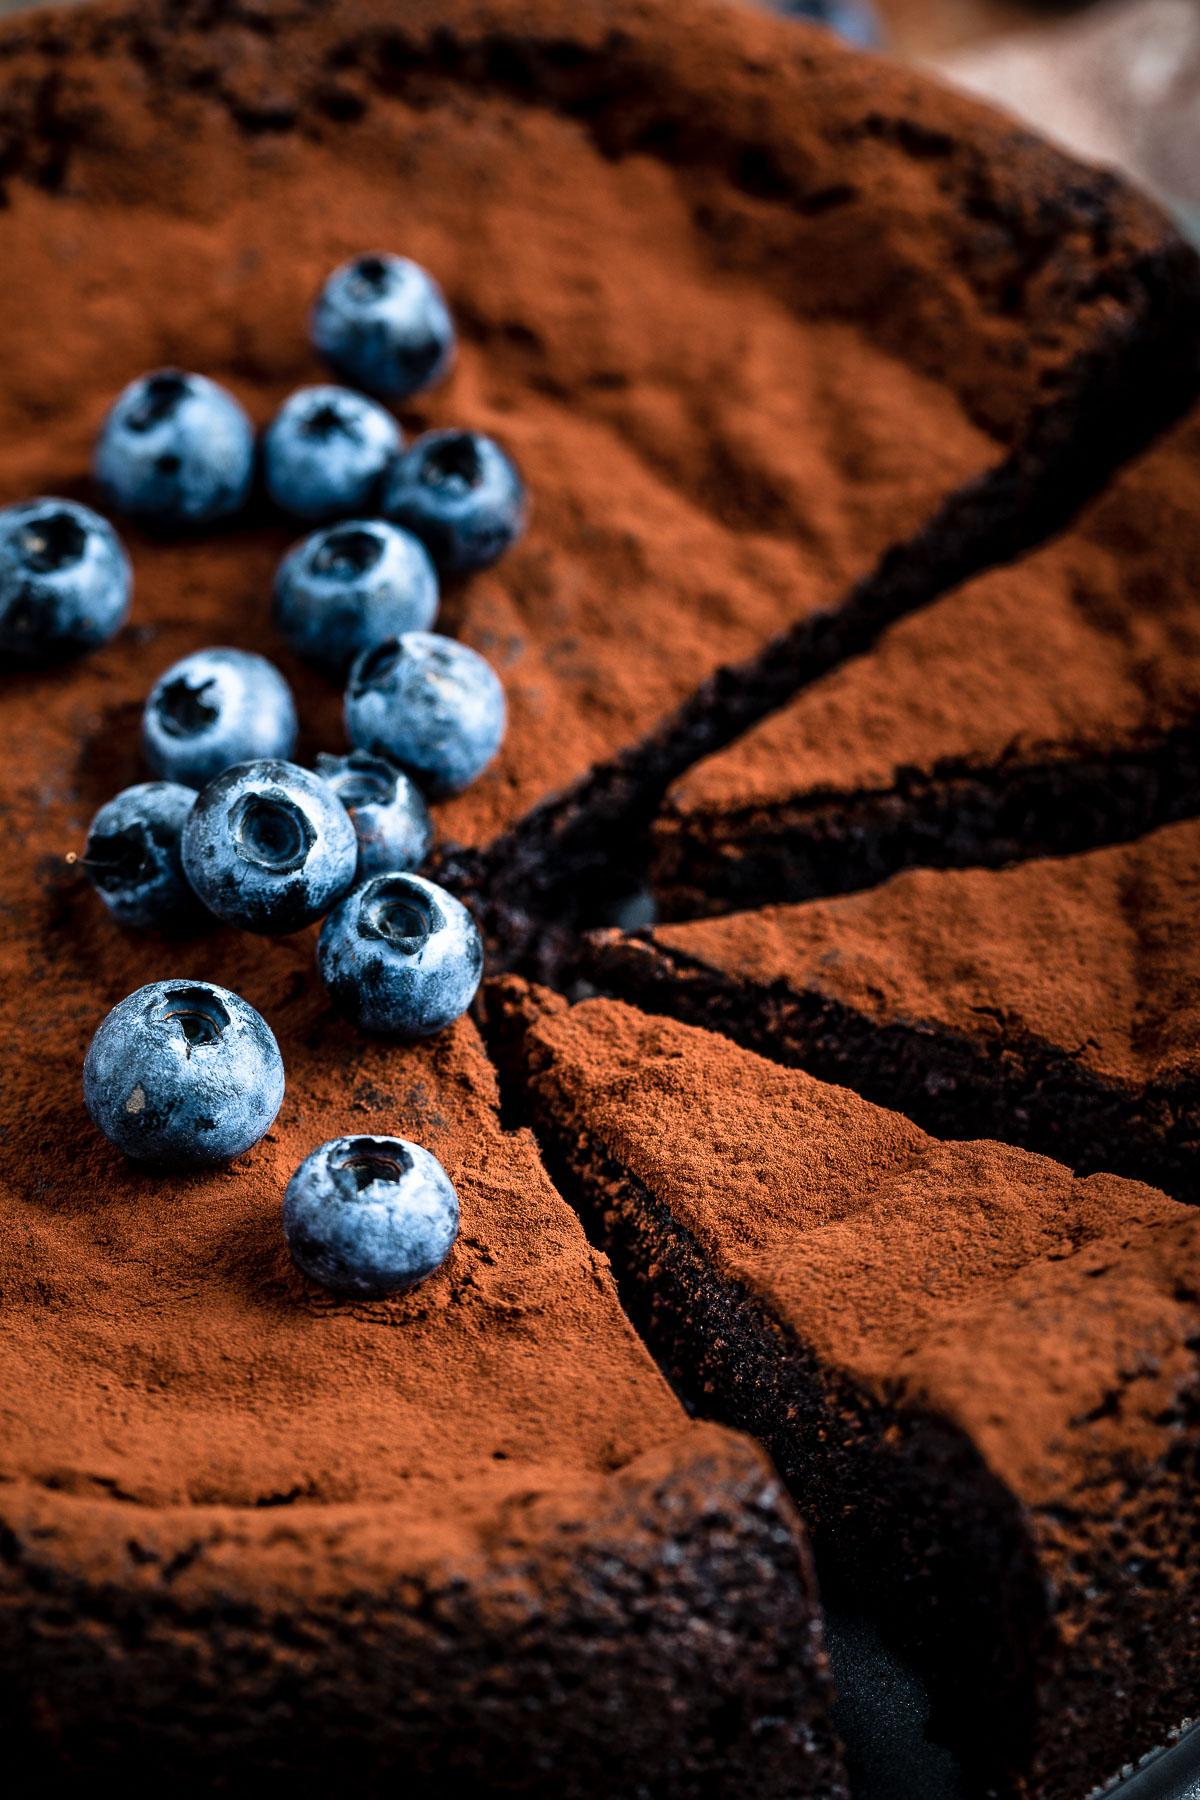 TORTA al CIOCCOLATO e MANDORLE vegan senza glutine senza farina gluten-free paleo FLOURLESS VEGAN CHOCOLATE CAKE recipe blueberry